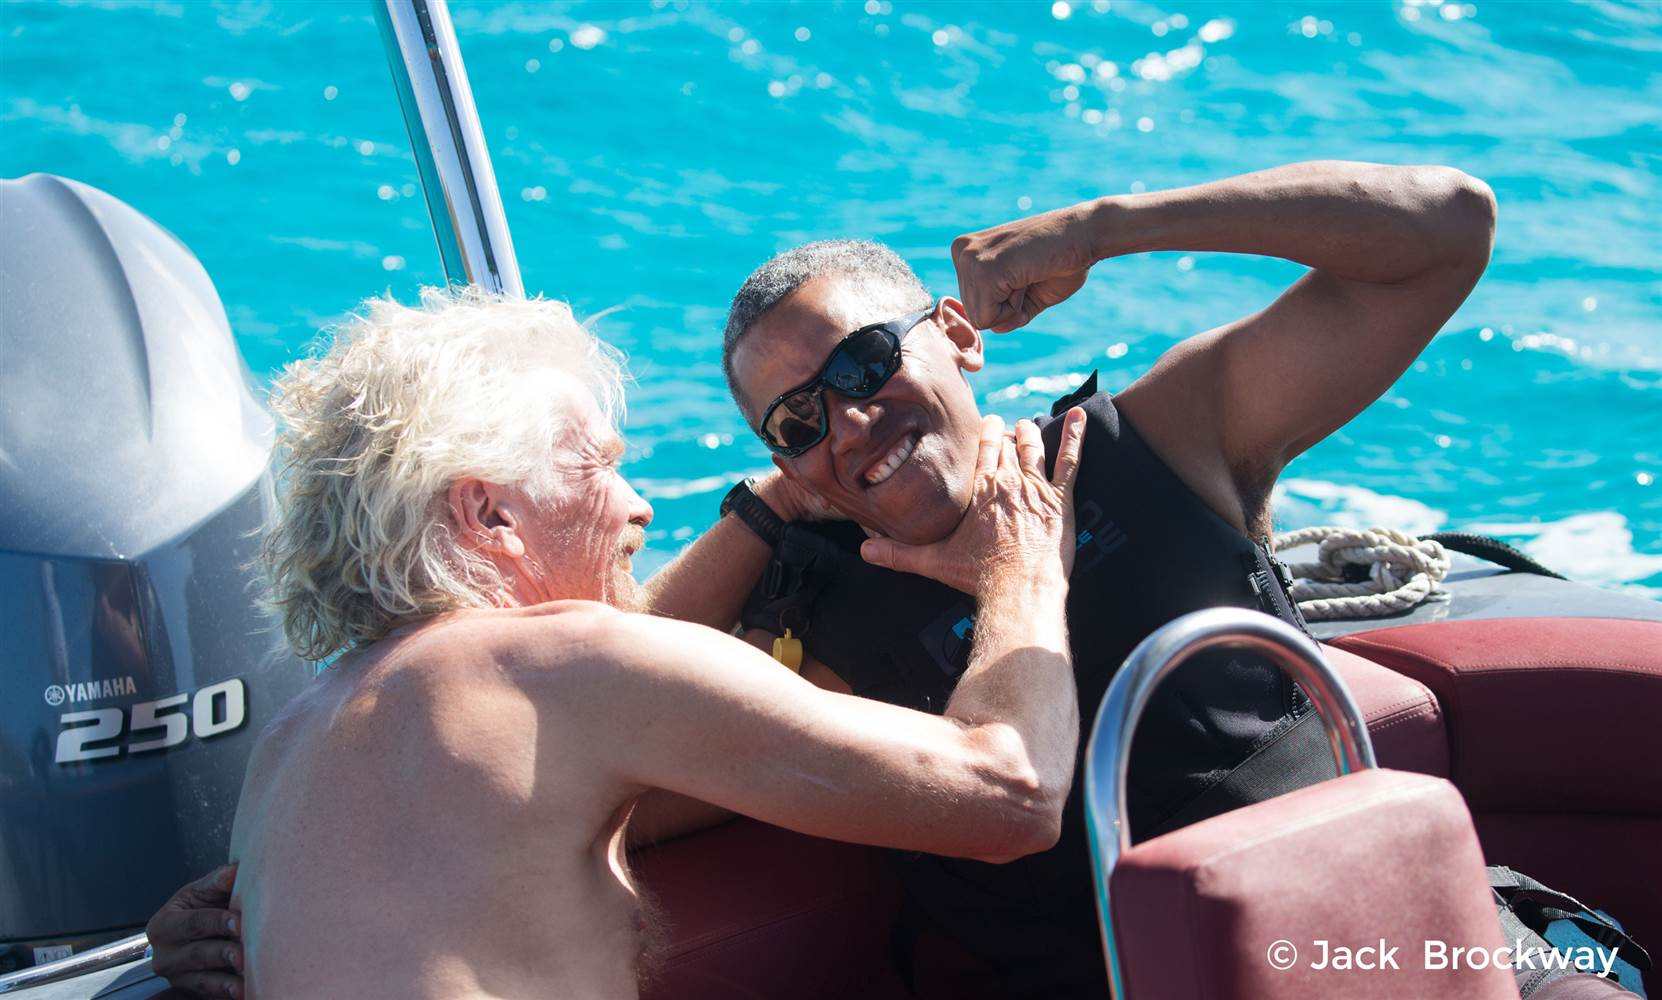 Obama w Branson play fighting beautiful turq water.jpg